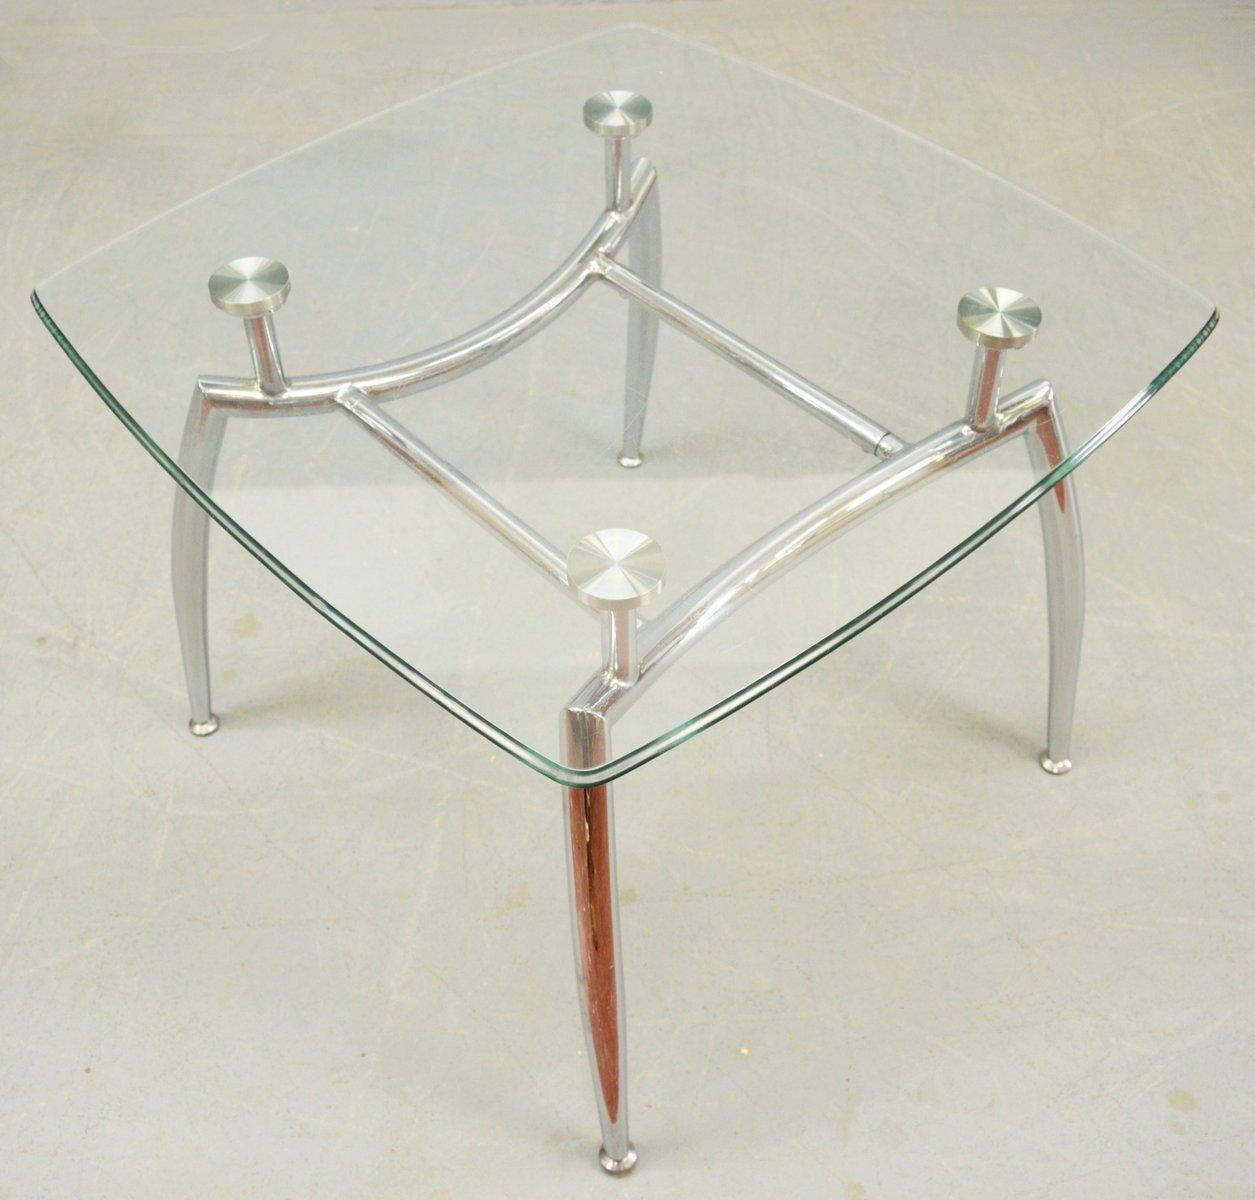 Glass U0026 Chrome Coffee Table, 1980s 7. $798.00. Price Per Piece